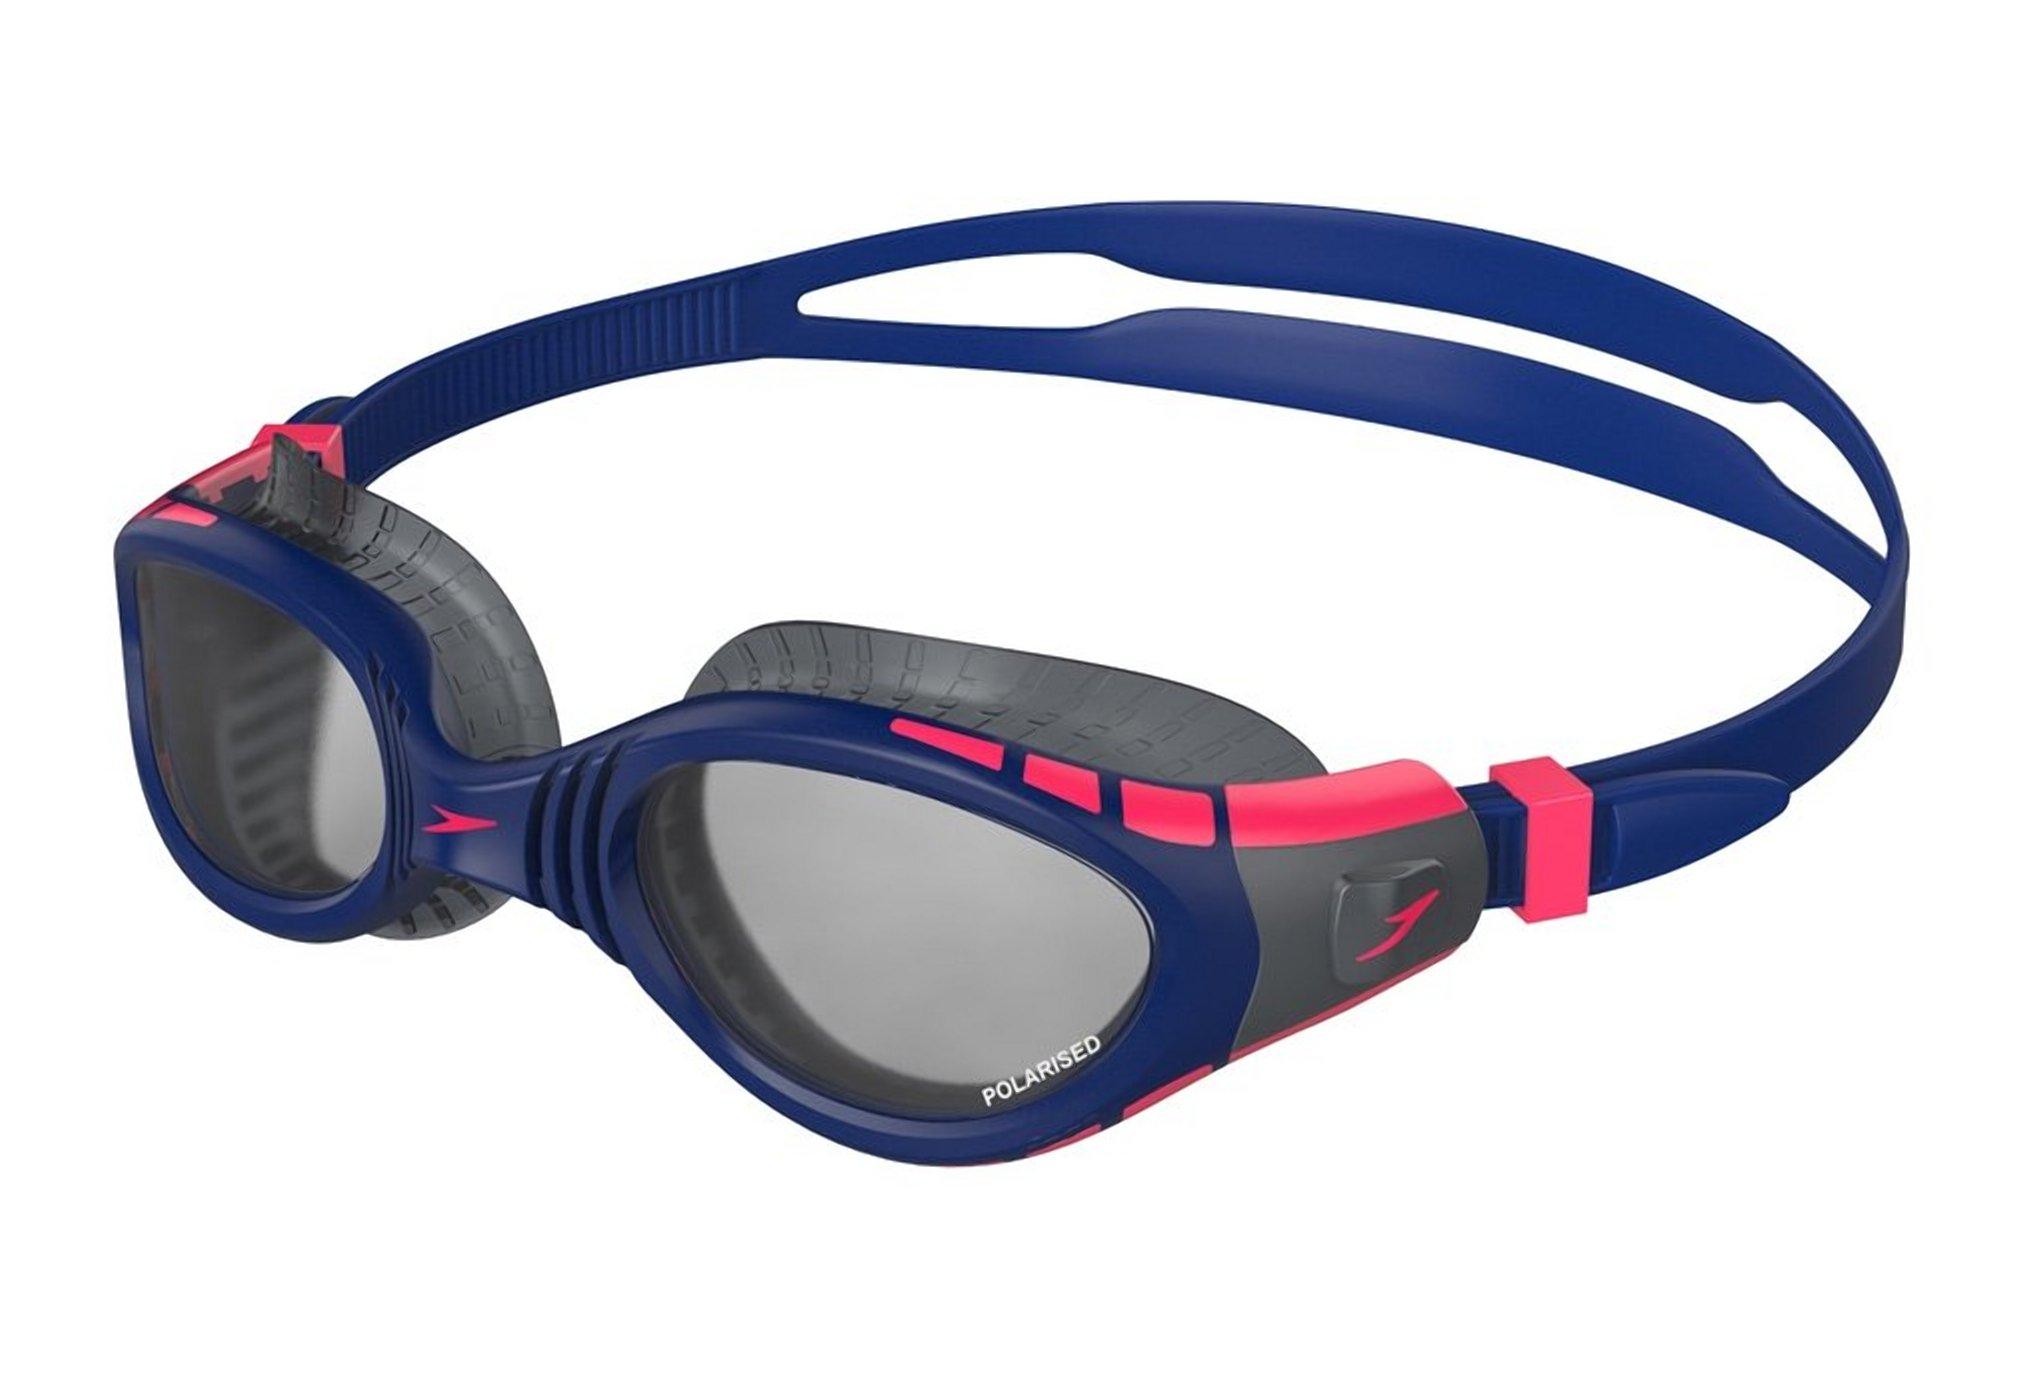 Speedo Futura Biofuse Flexiseal Triathlon Triathlon-Natation